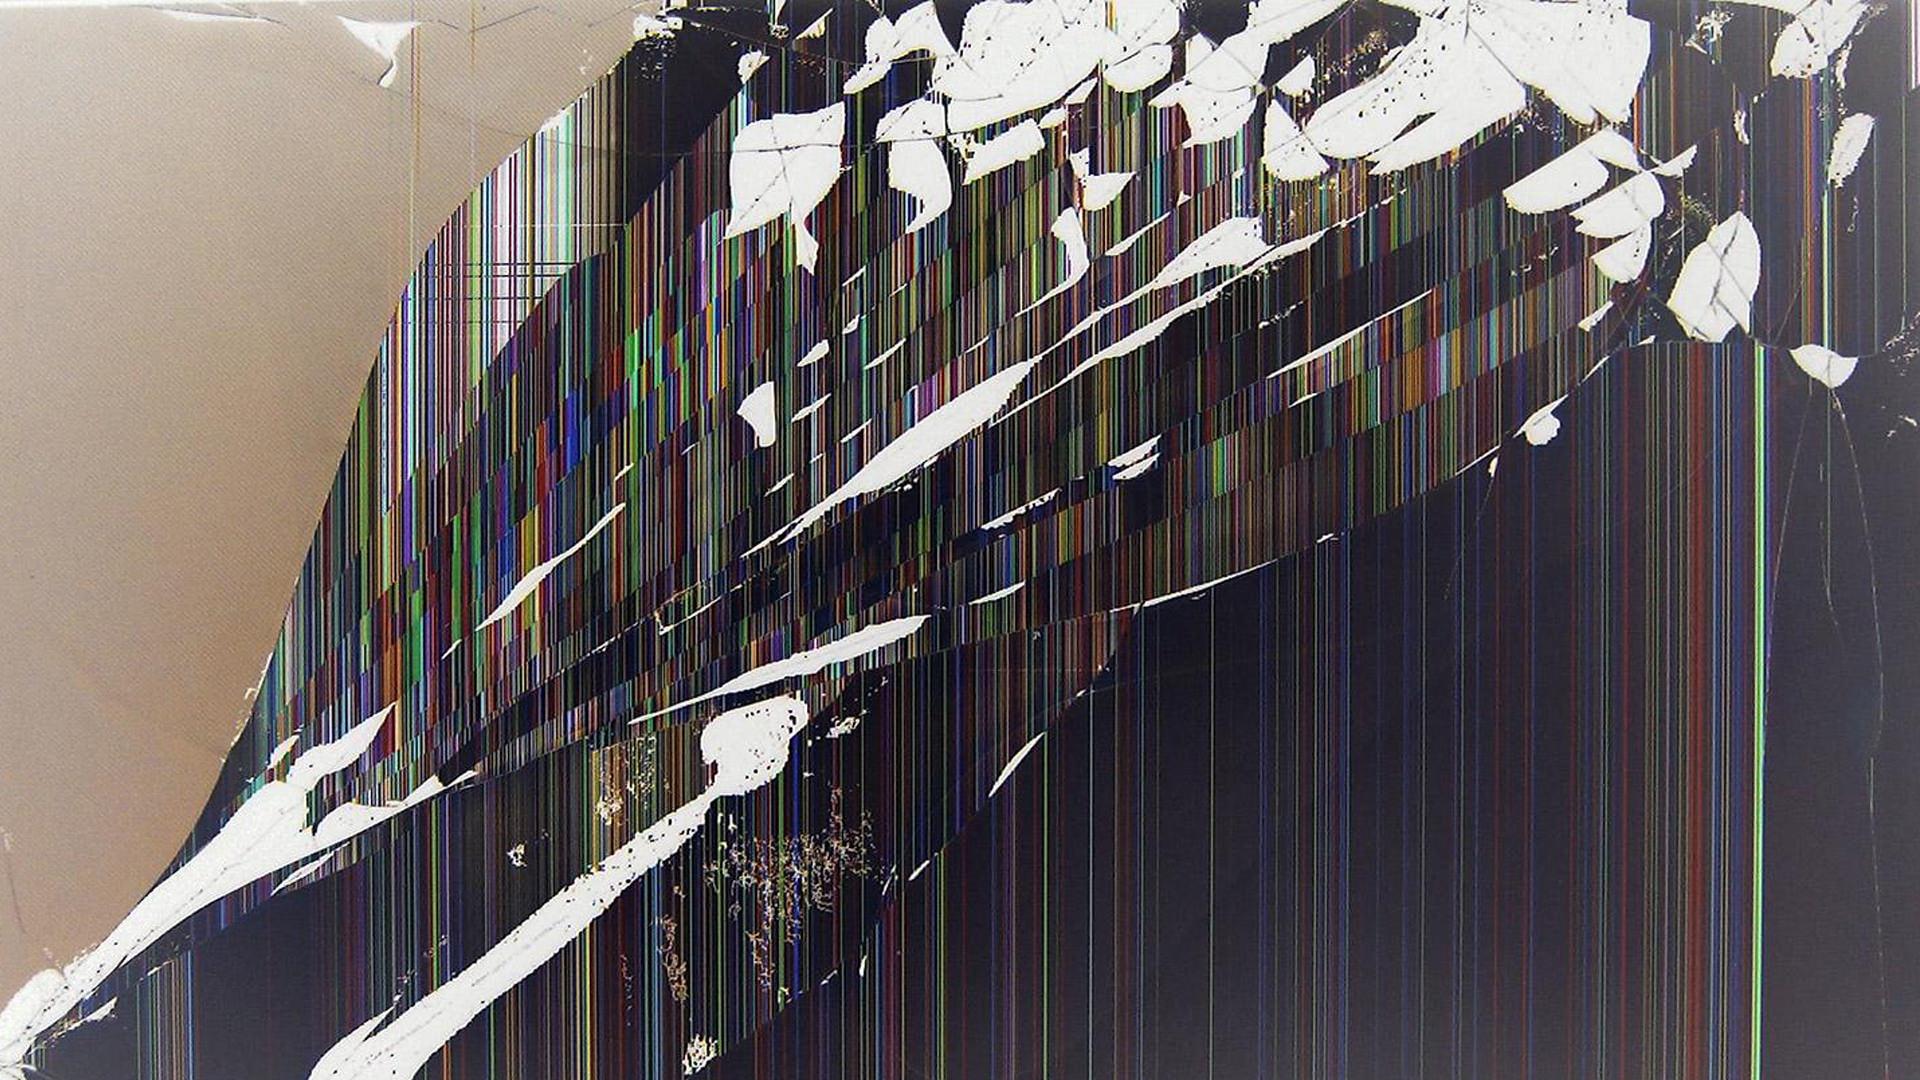 broken monitor prank screen - photo #9